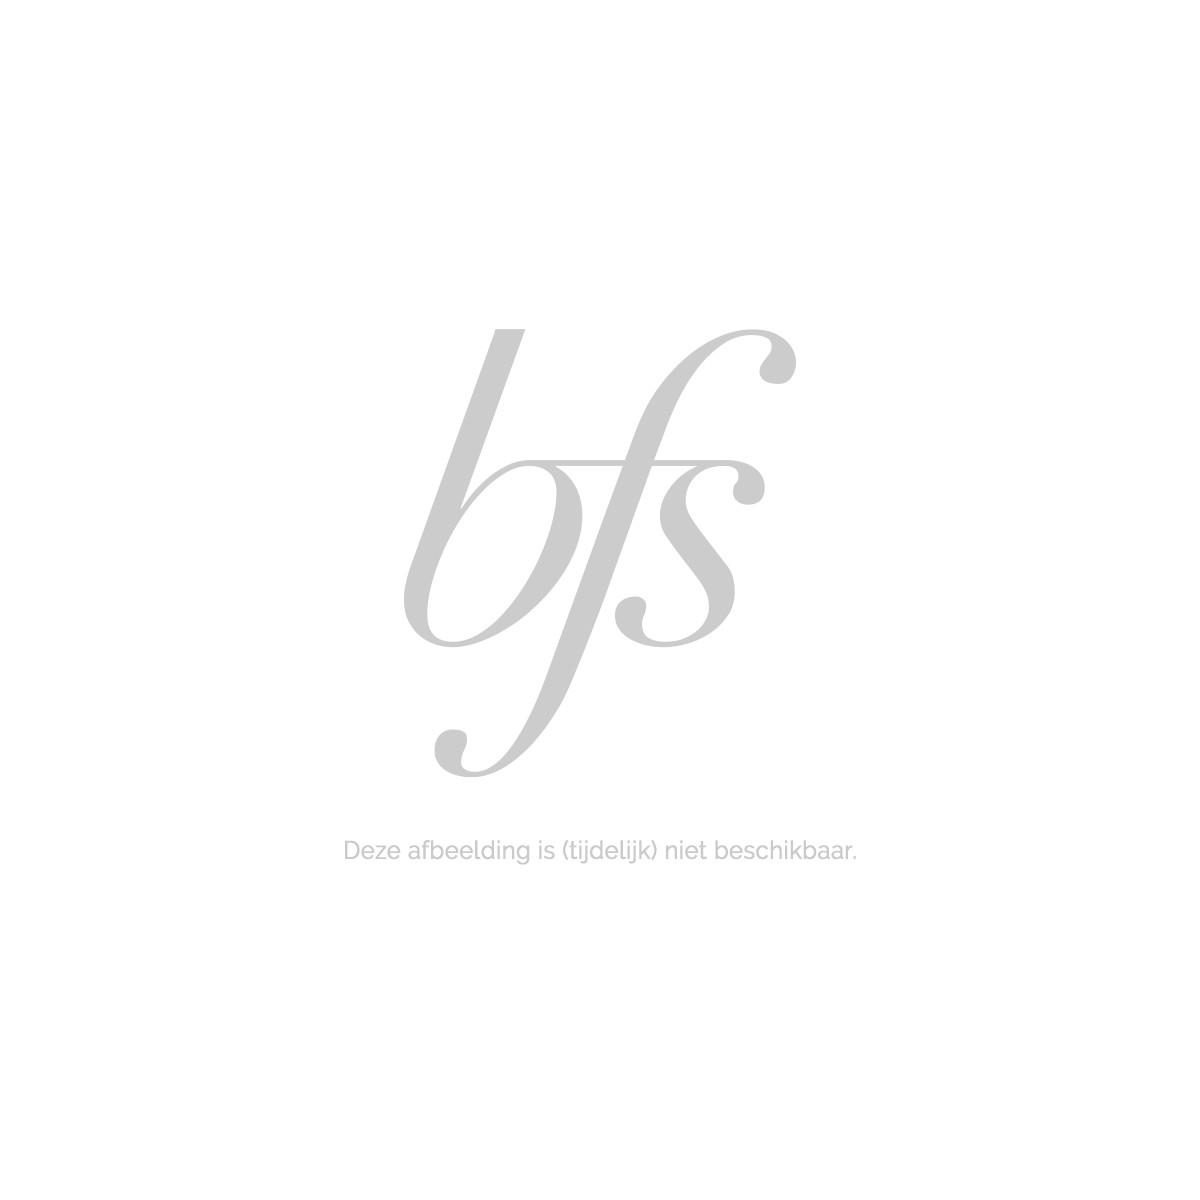 Hildegard Braukmann Sun and Care Aloe Vera Körperlotion SPF 20